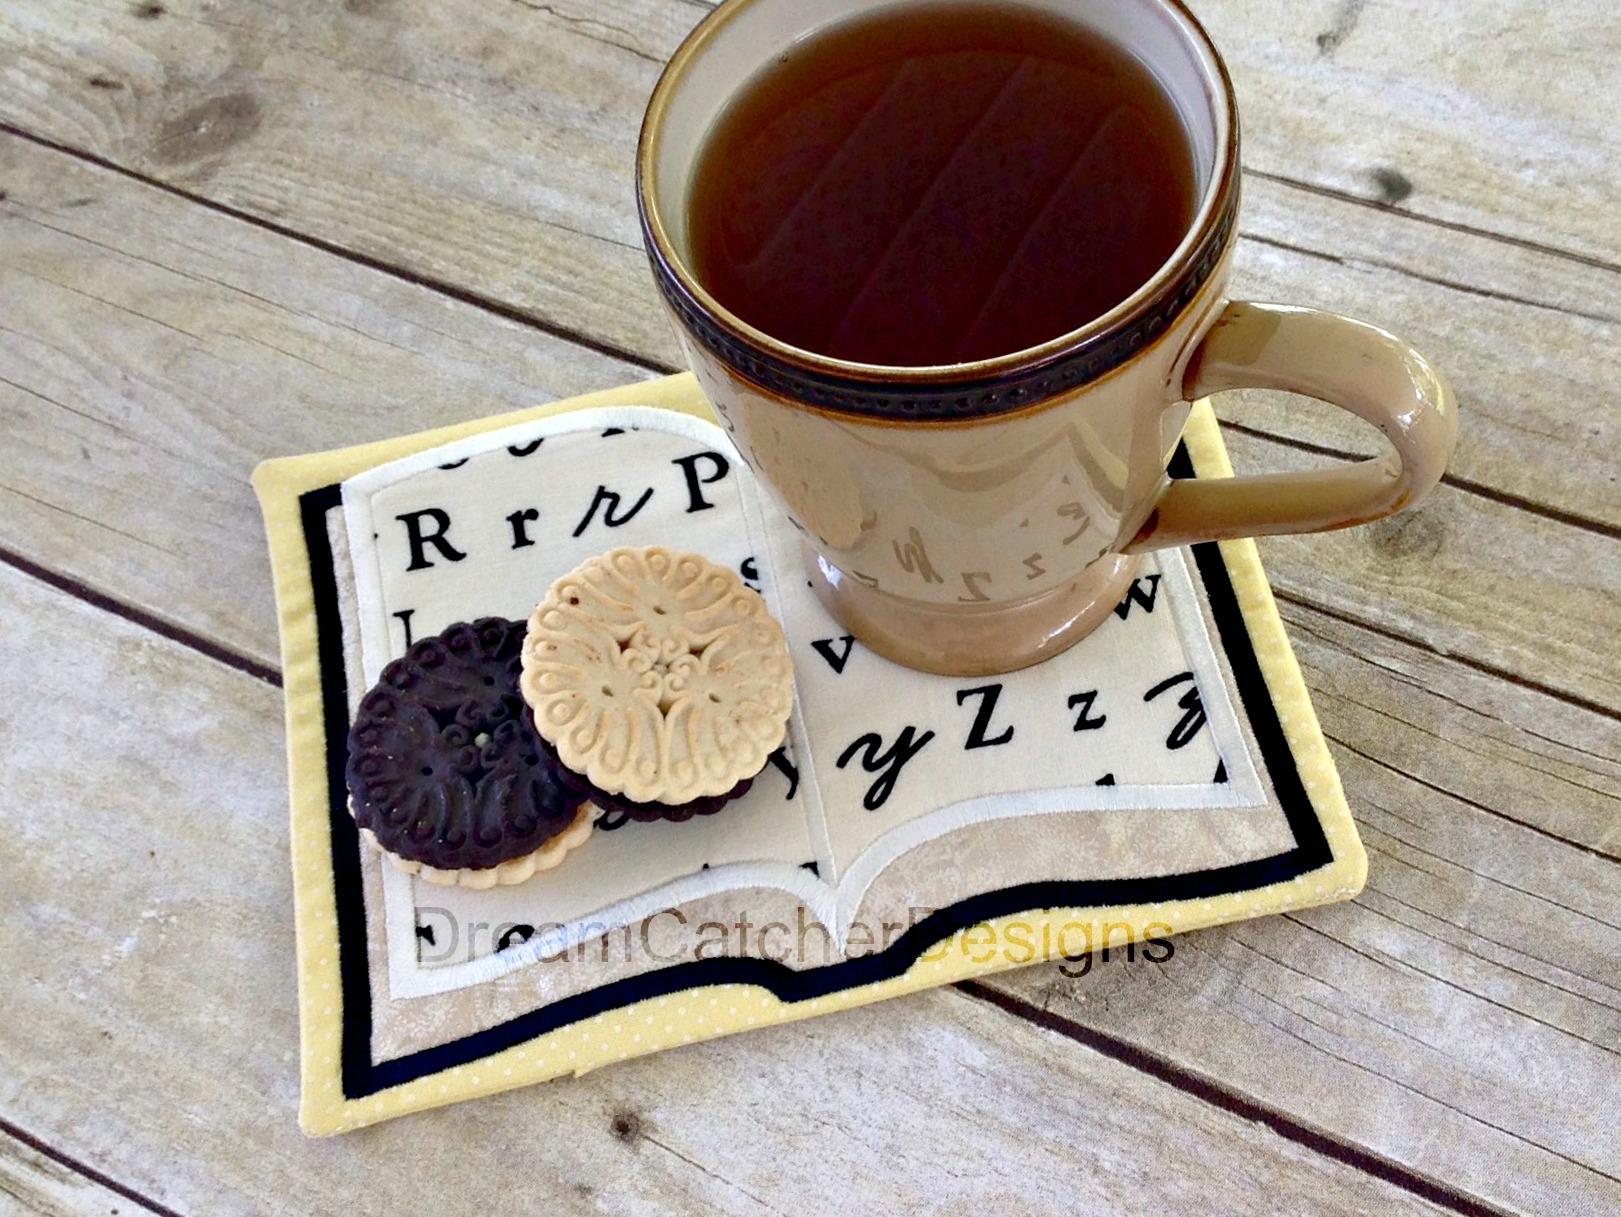 In The Hoop Book Mug Rug Embroidery Design The Creative Frenzy